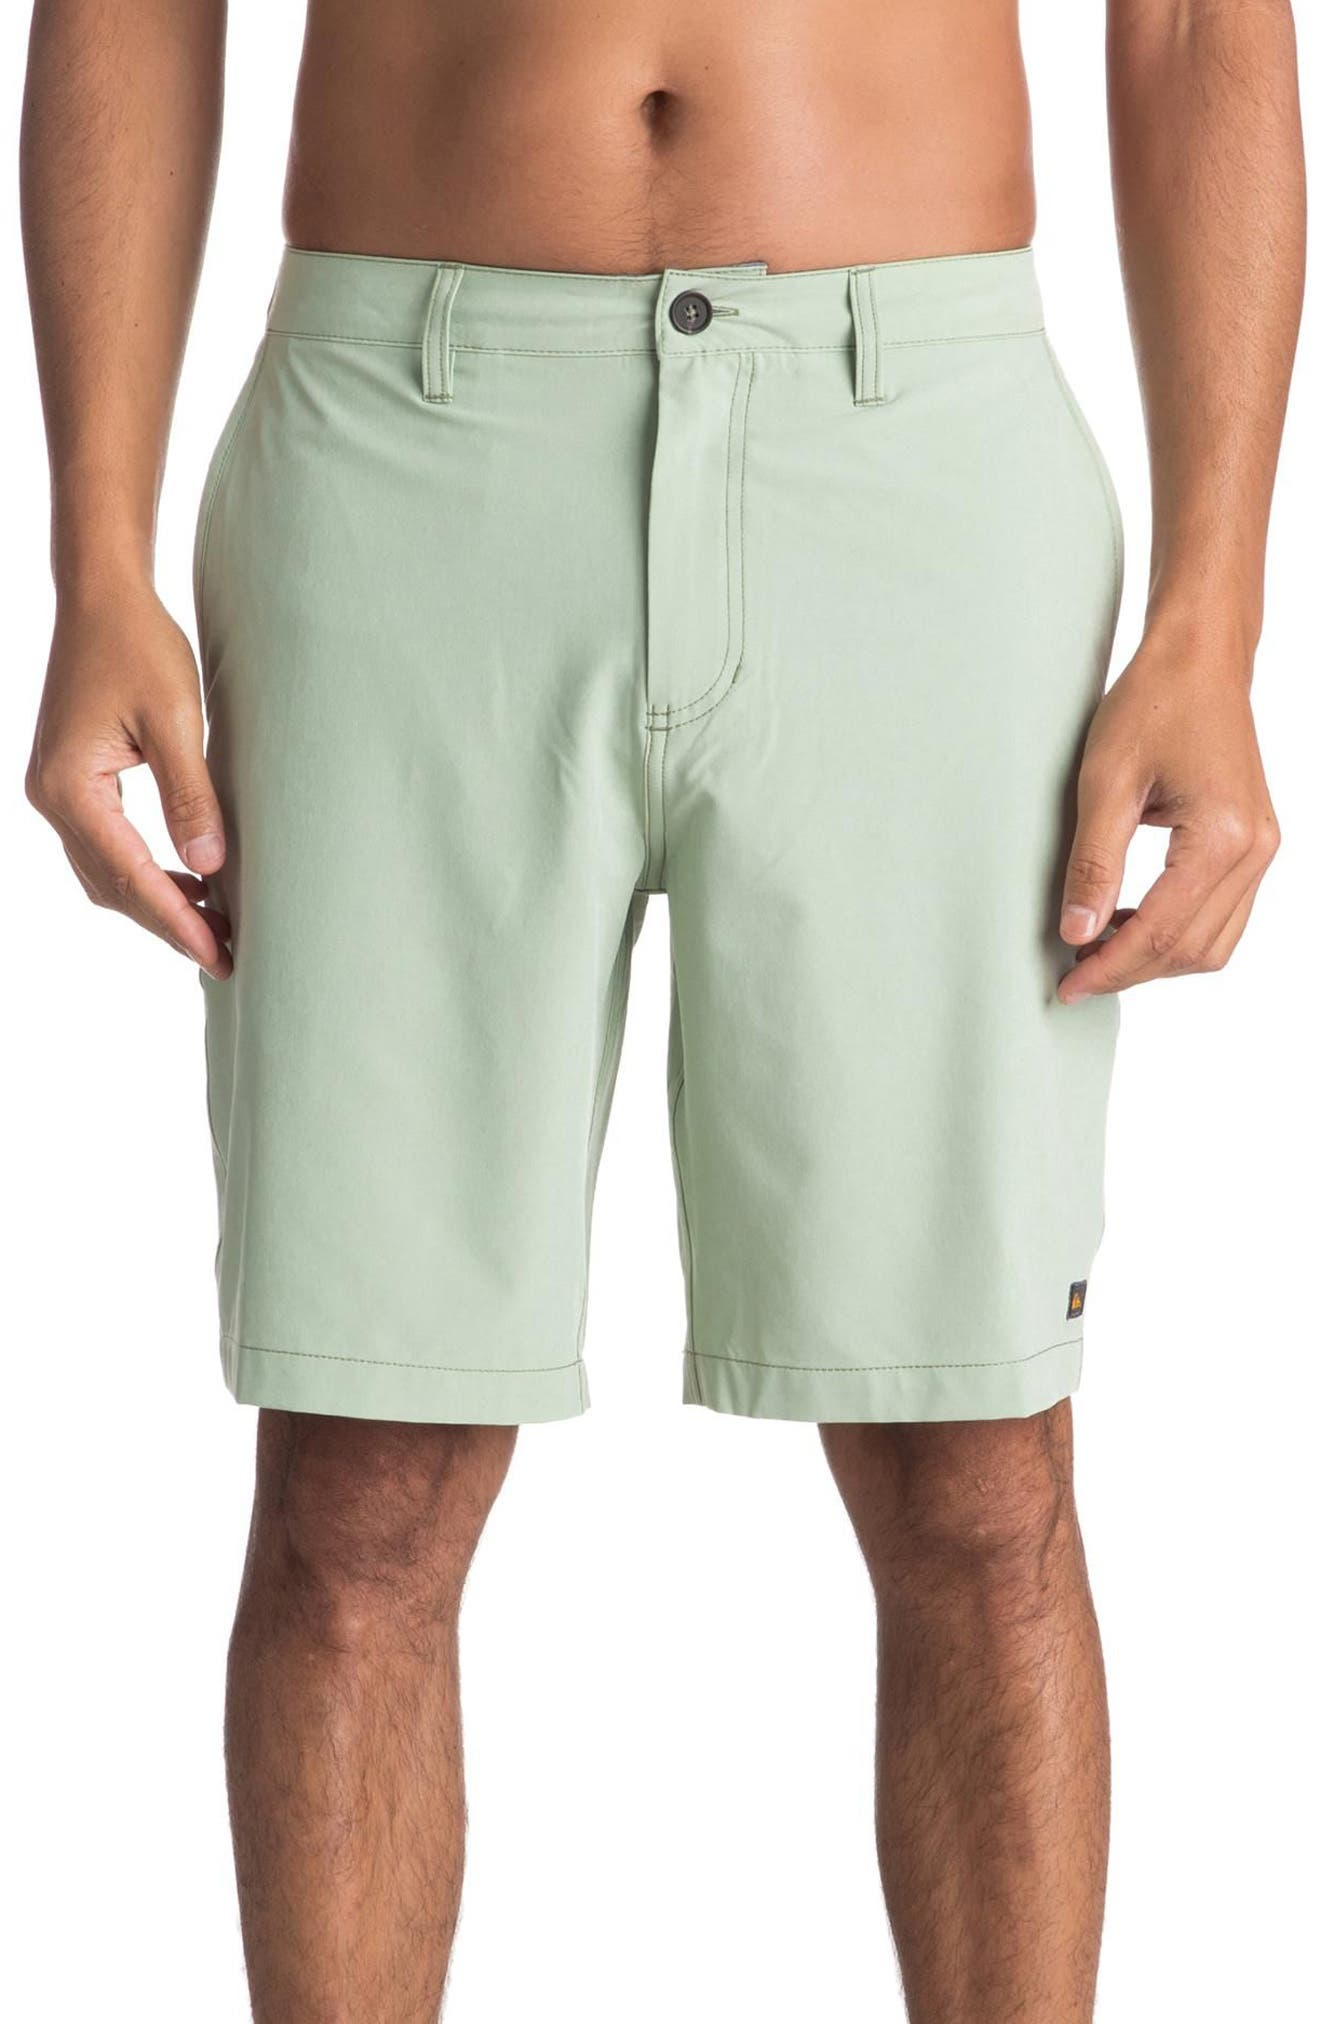 Quiksilver Vagabond Amphibian Board Shorts